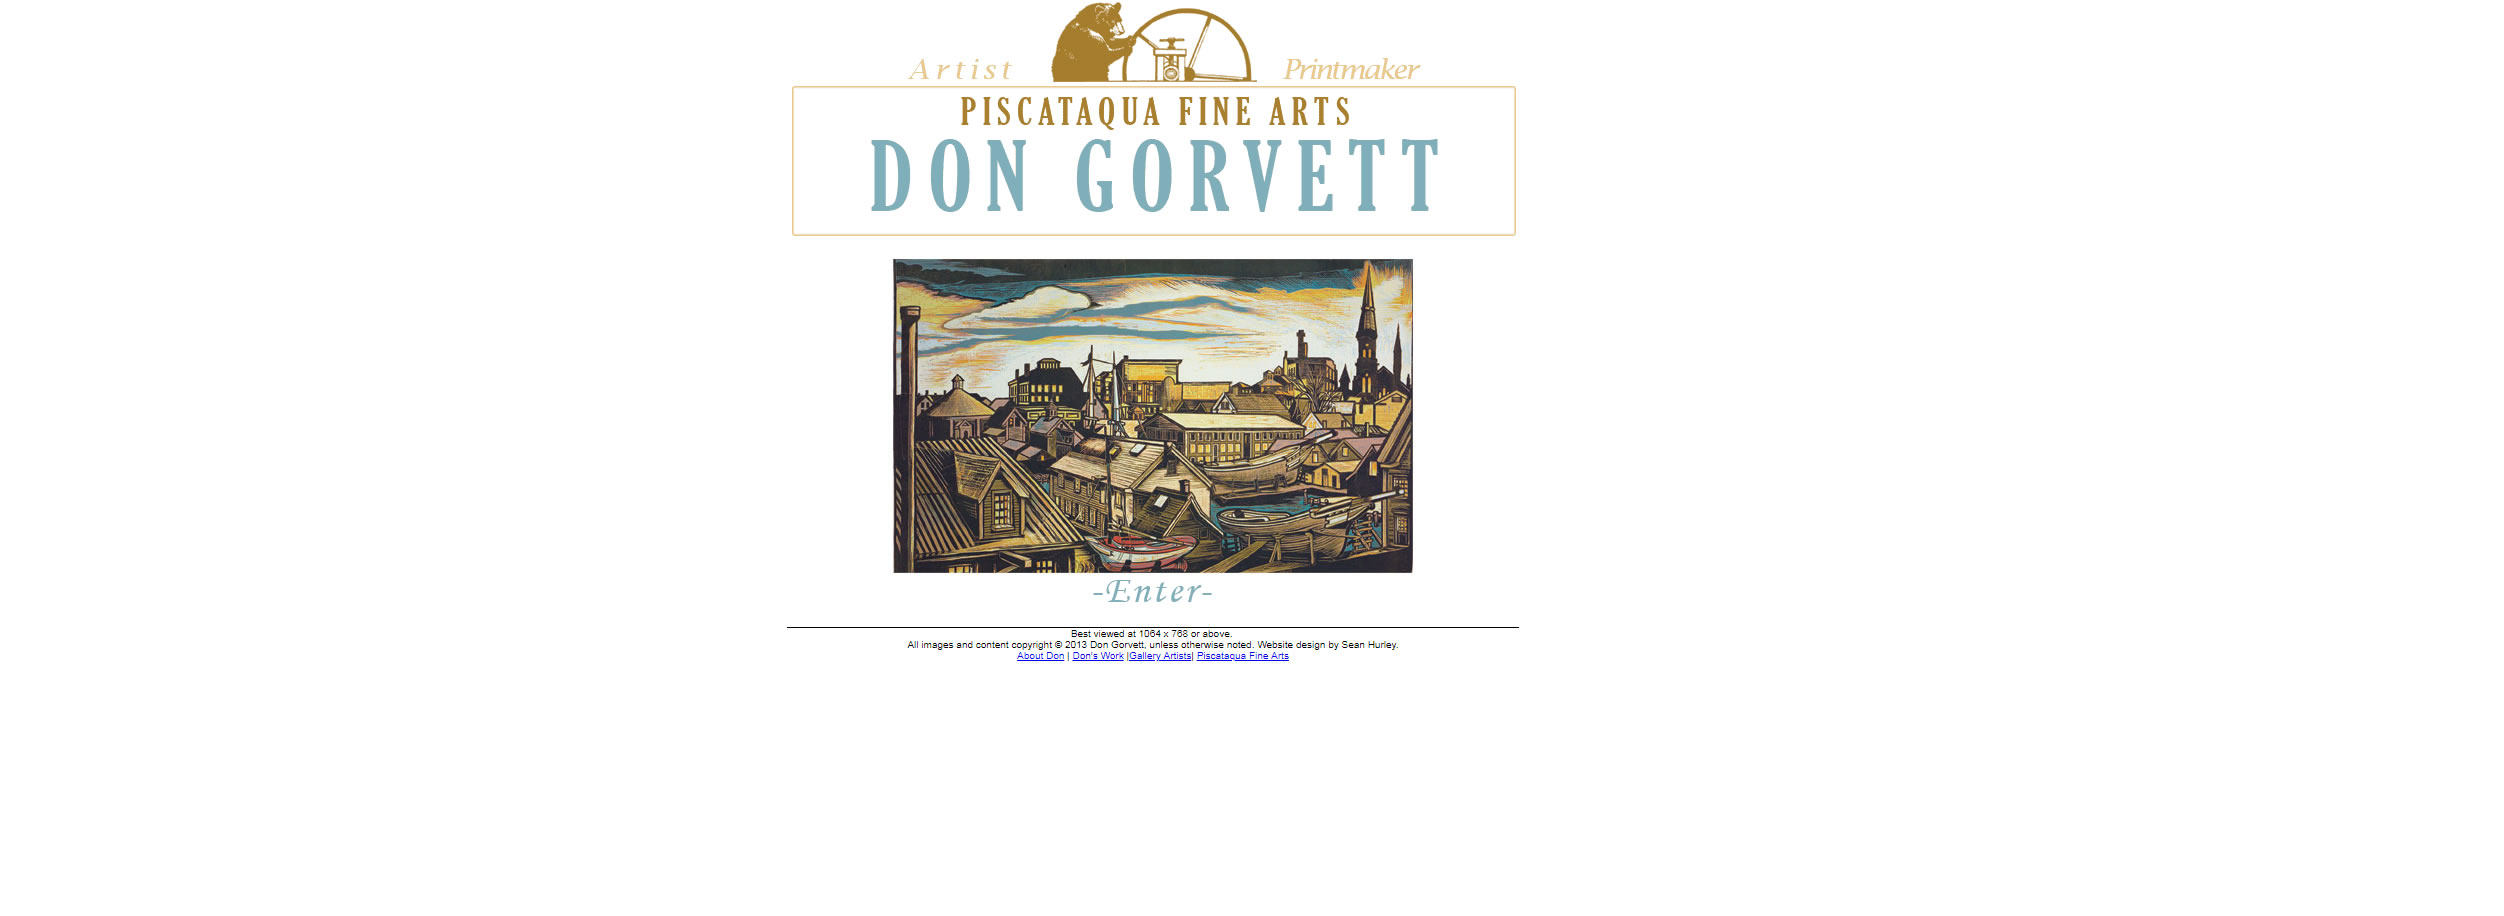 don_gorvett_galeria_de_gravura